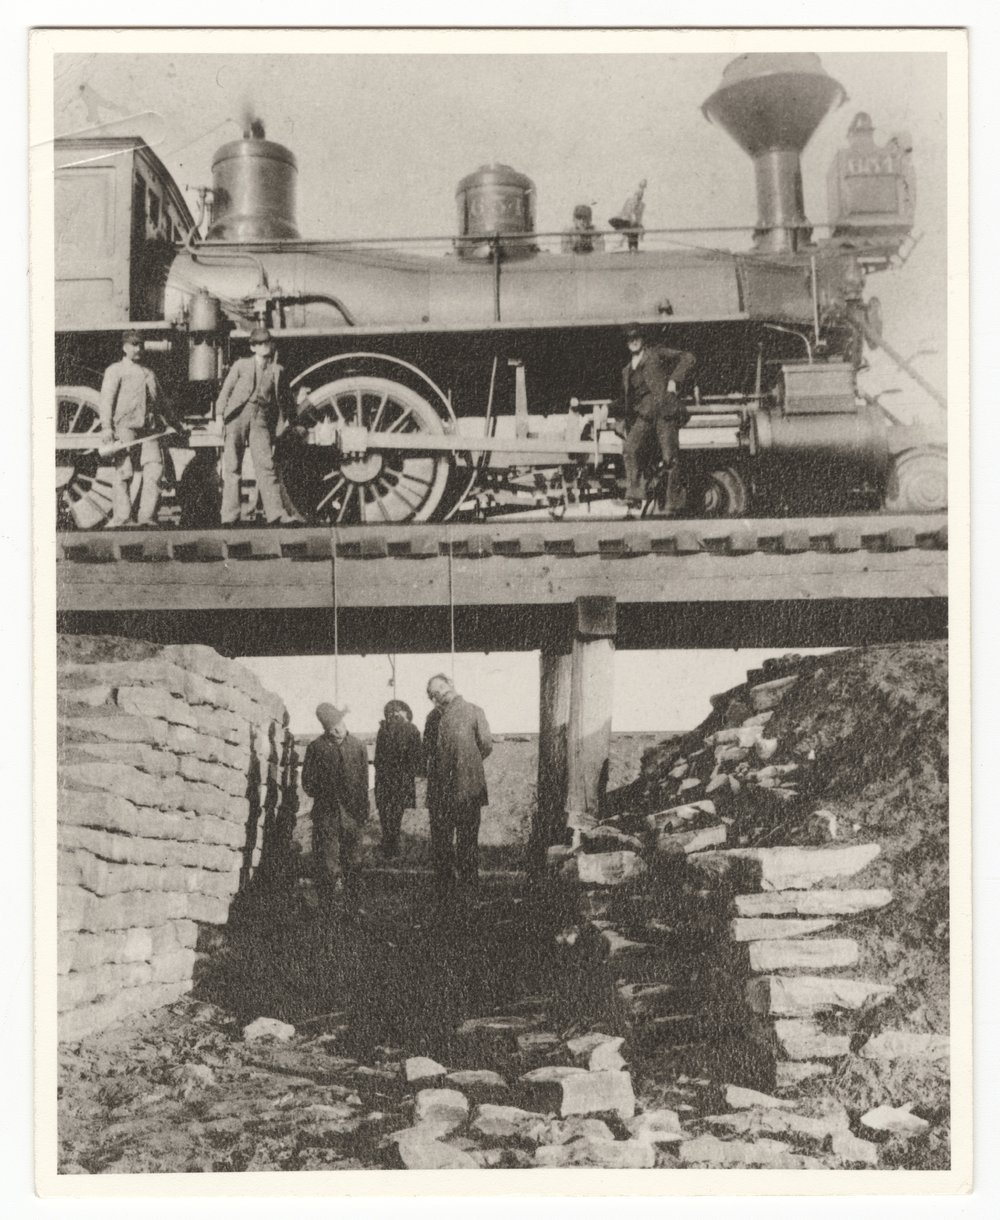 Lynching of J. G. Burton, John Gay, and William Gay in Russell County, Kansas - 1